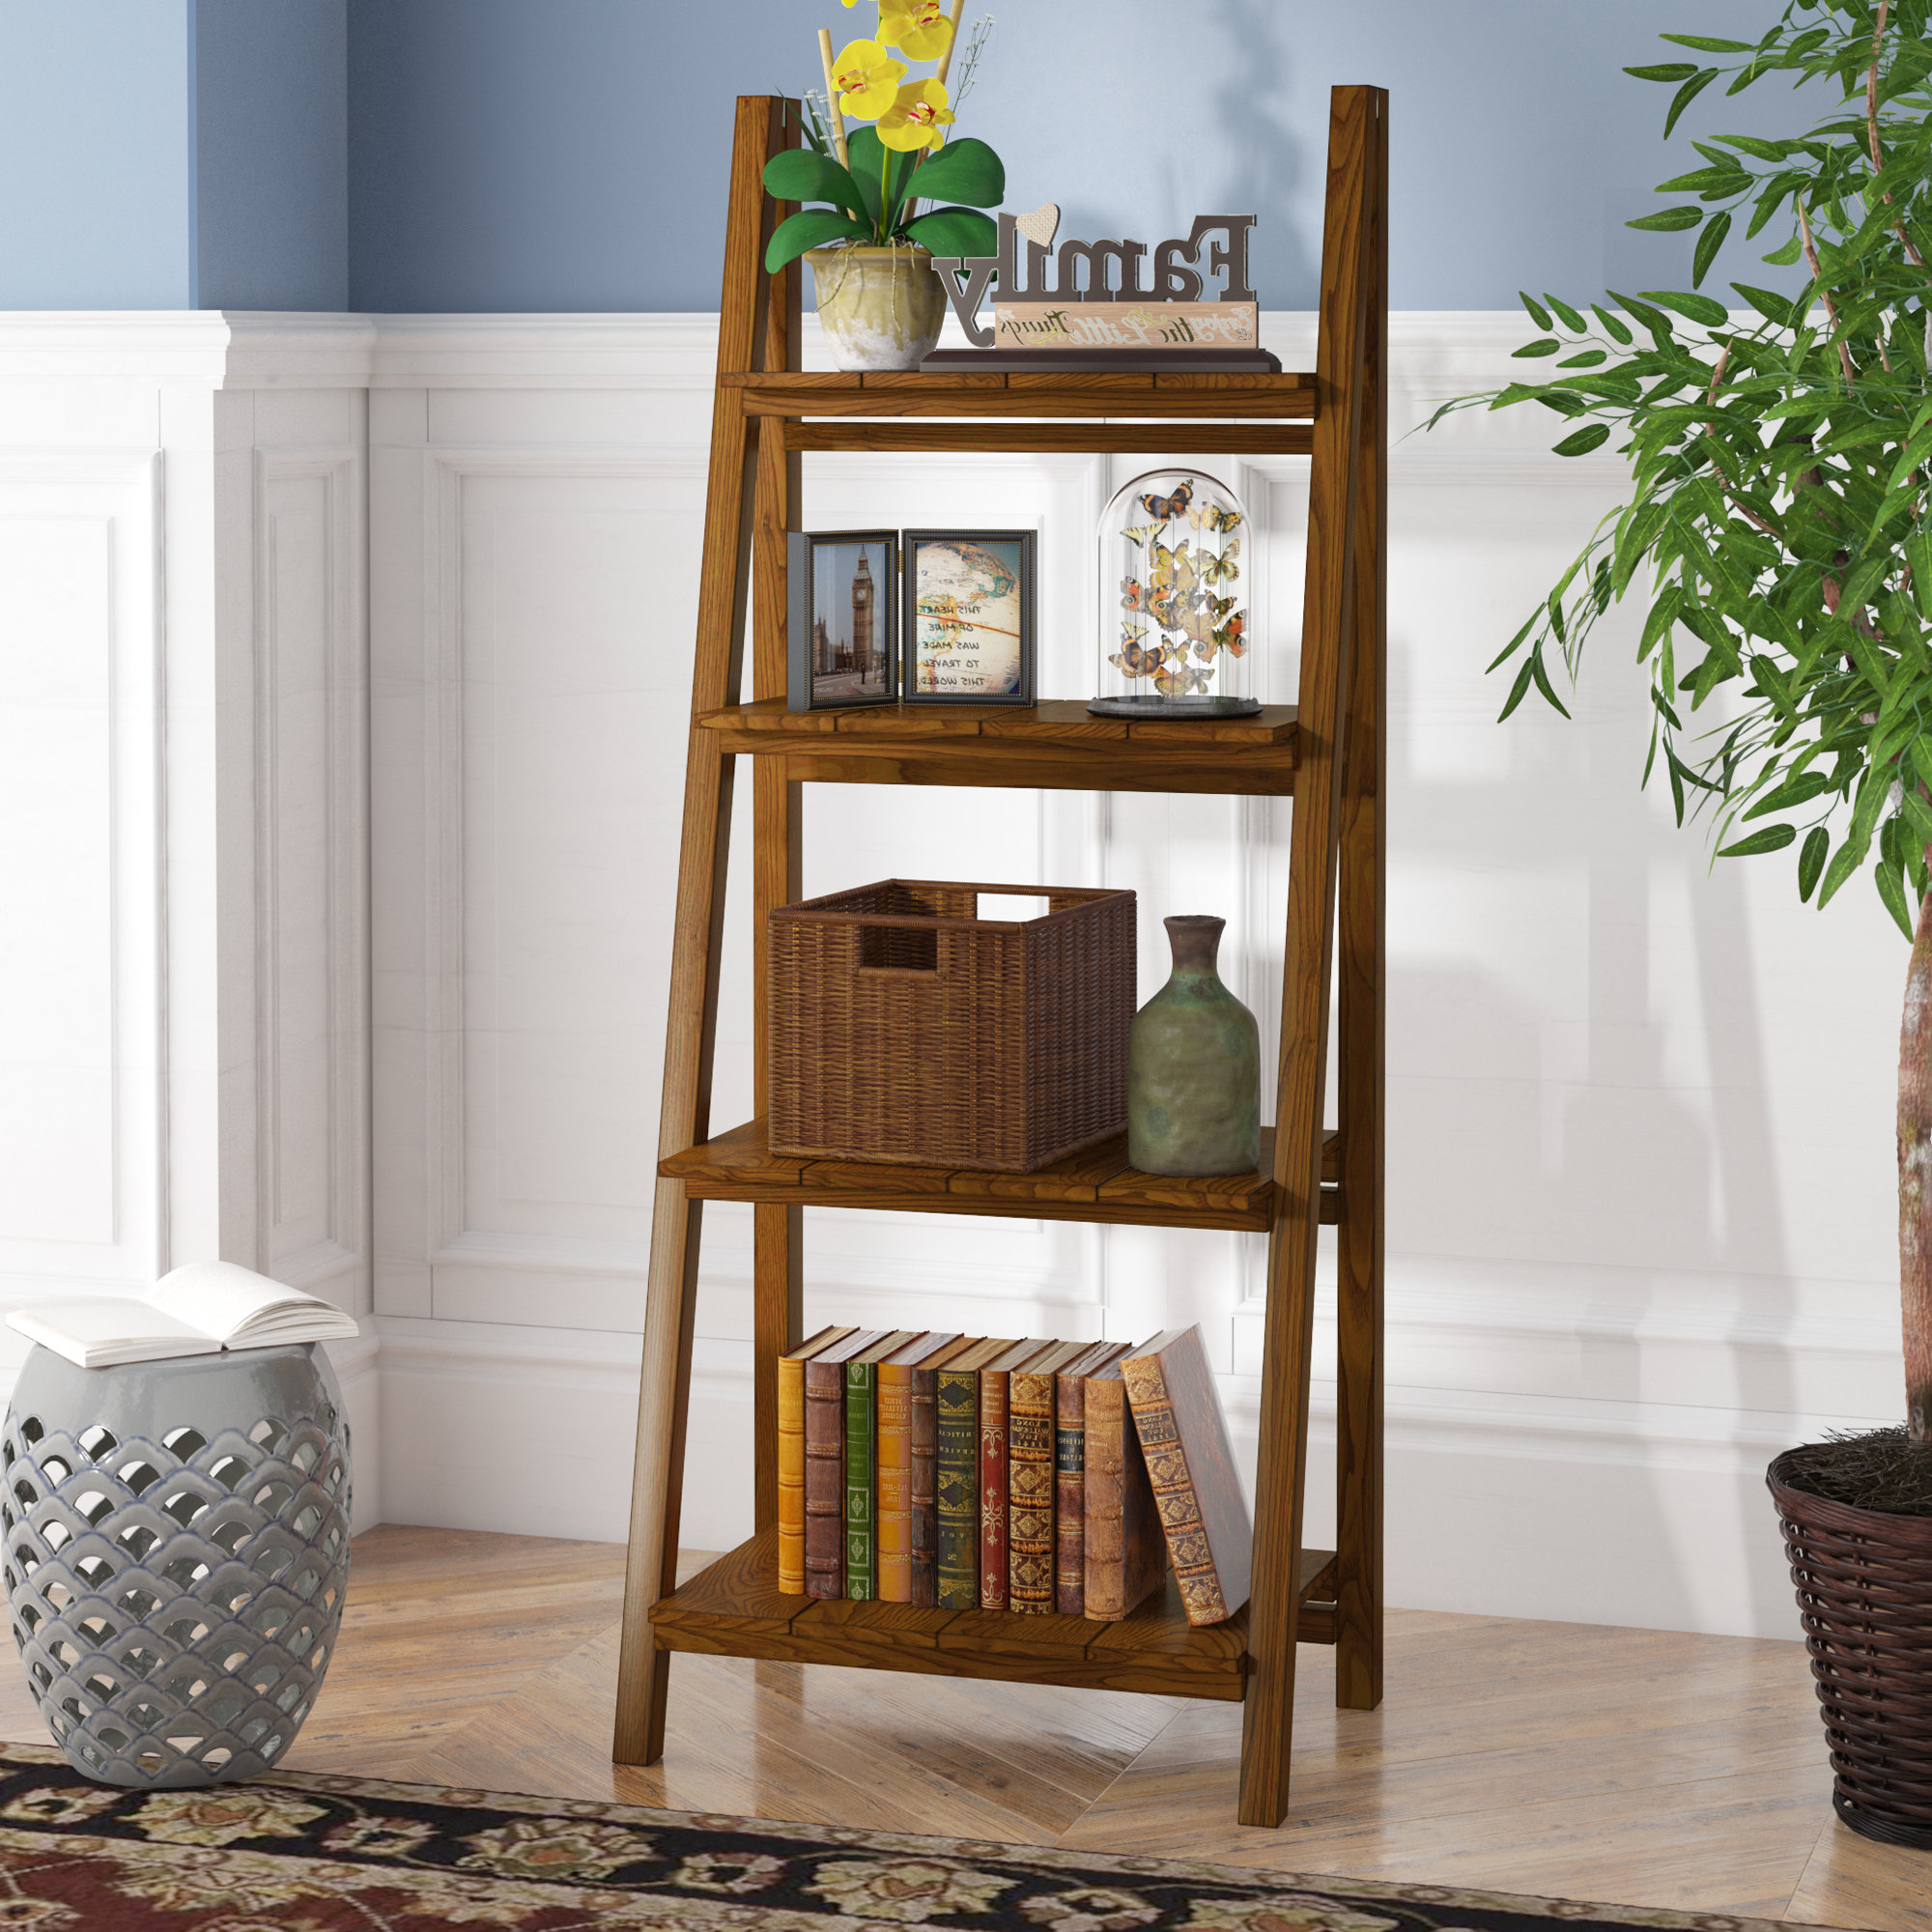 2019 Brock Ladder Bookcases Intended For Bordelon Slatted Ladder Bookcase (View 1 of 20)